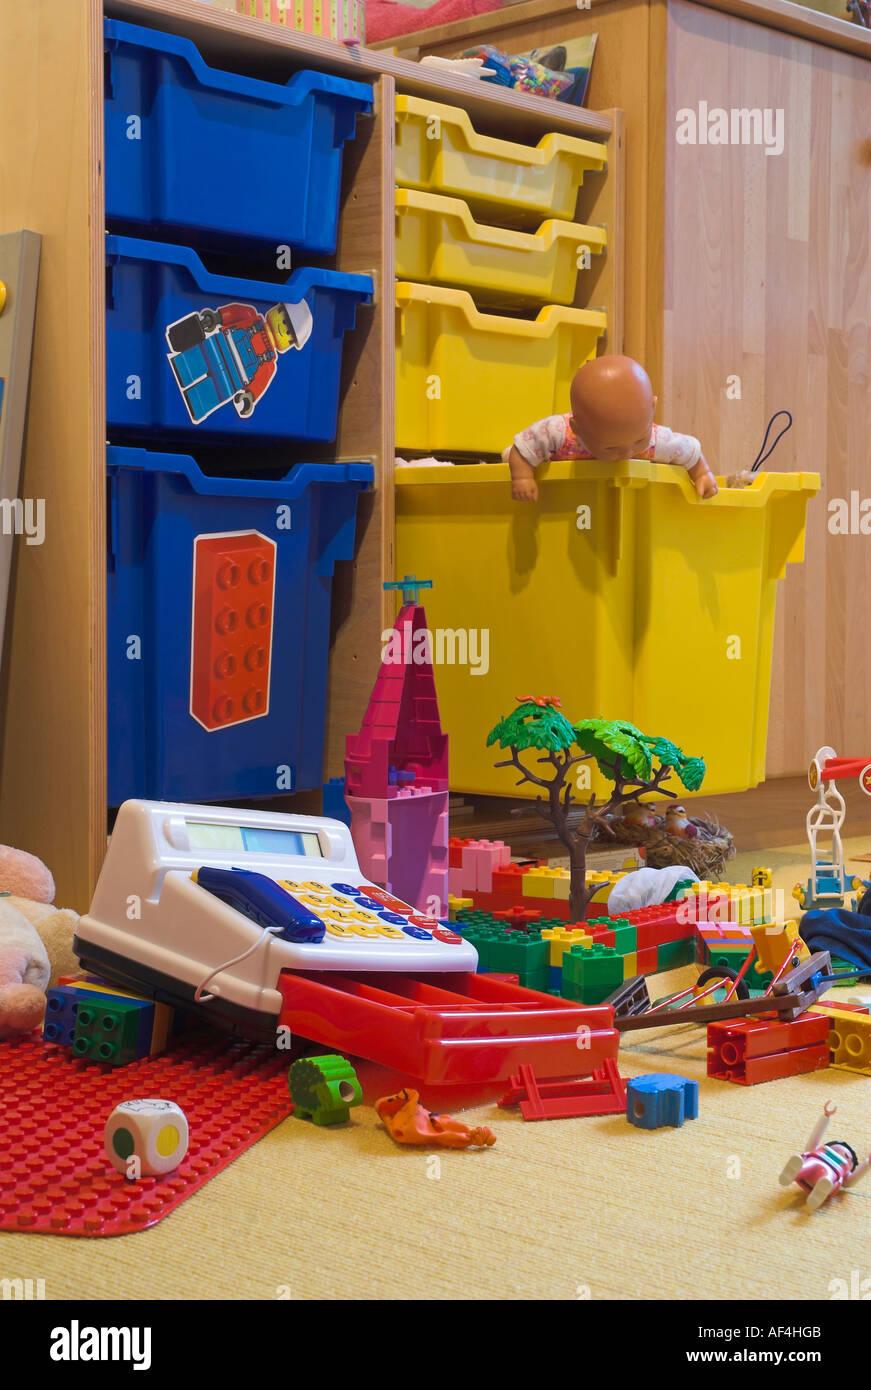 Messy playroom - Stock Image